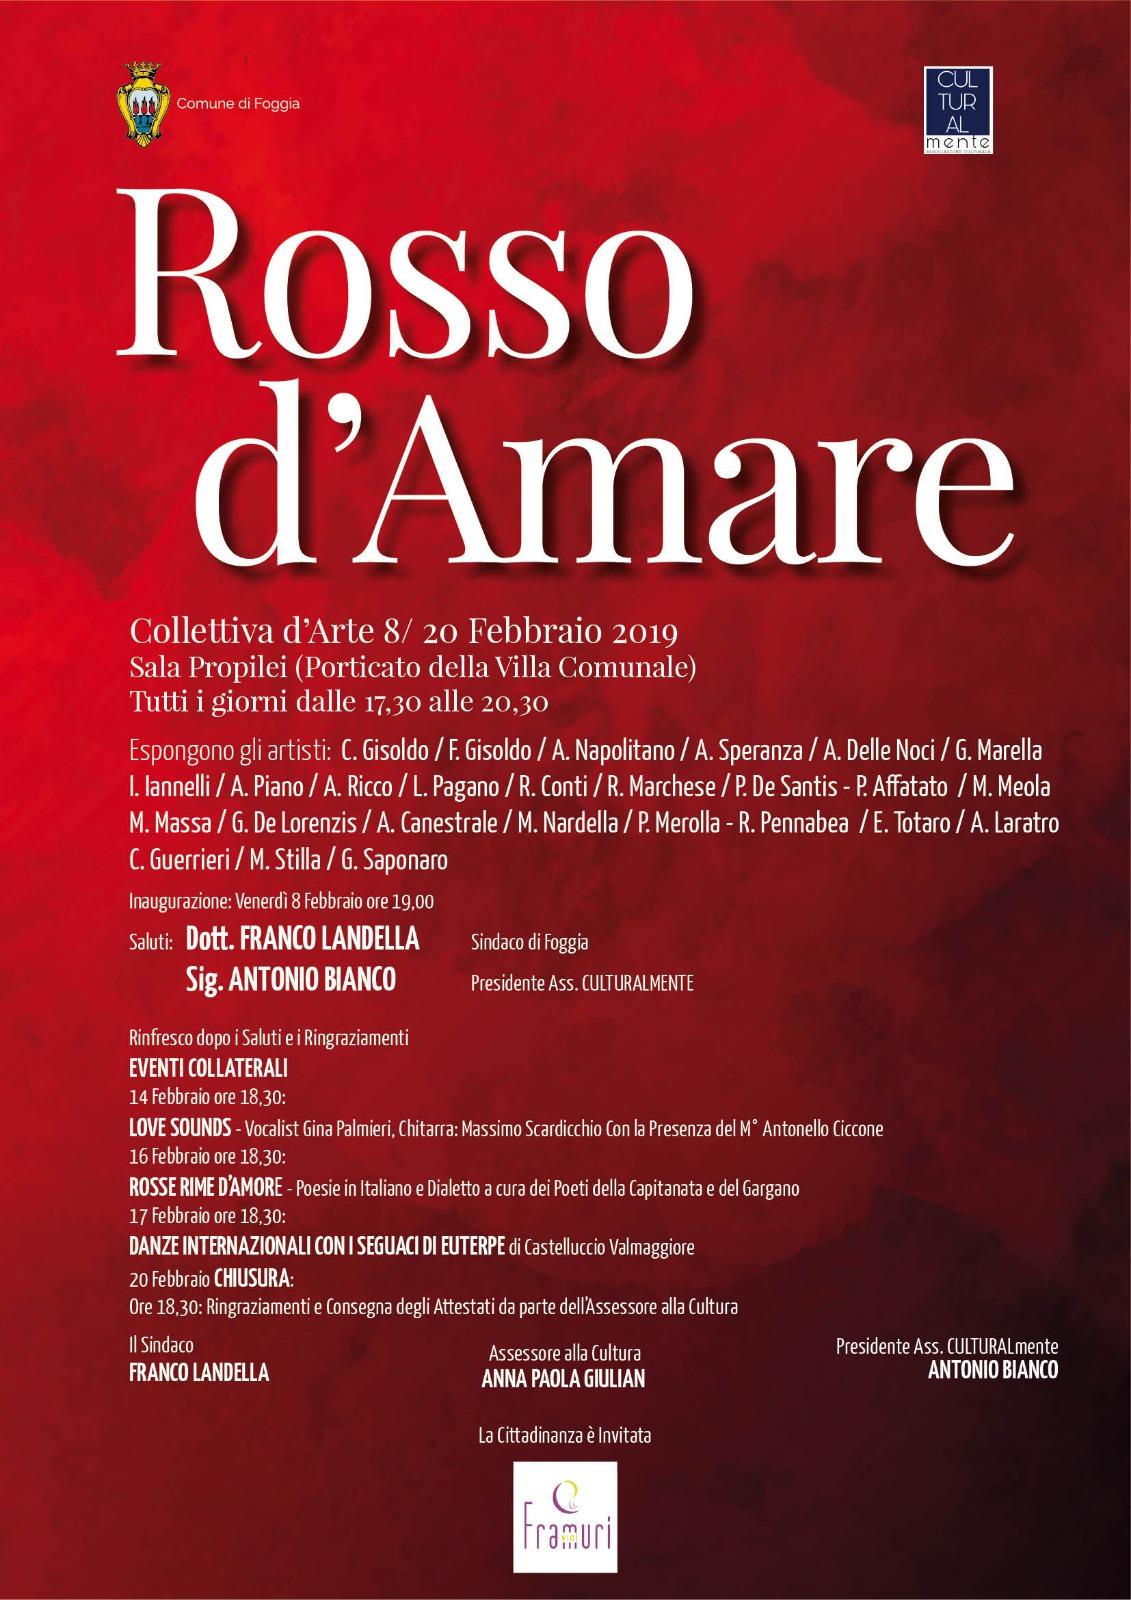 Rosso d'Amare